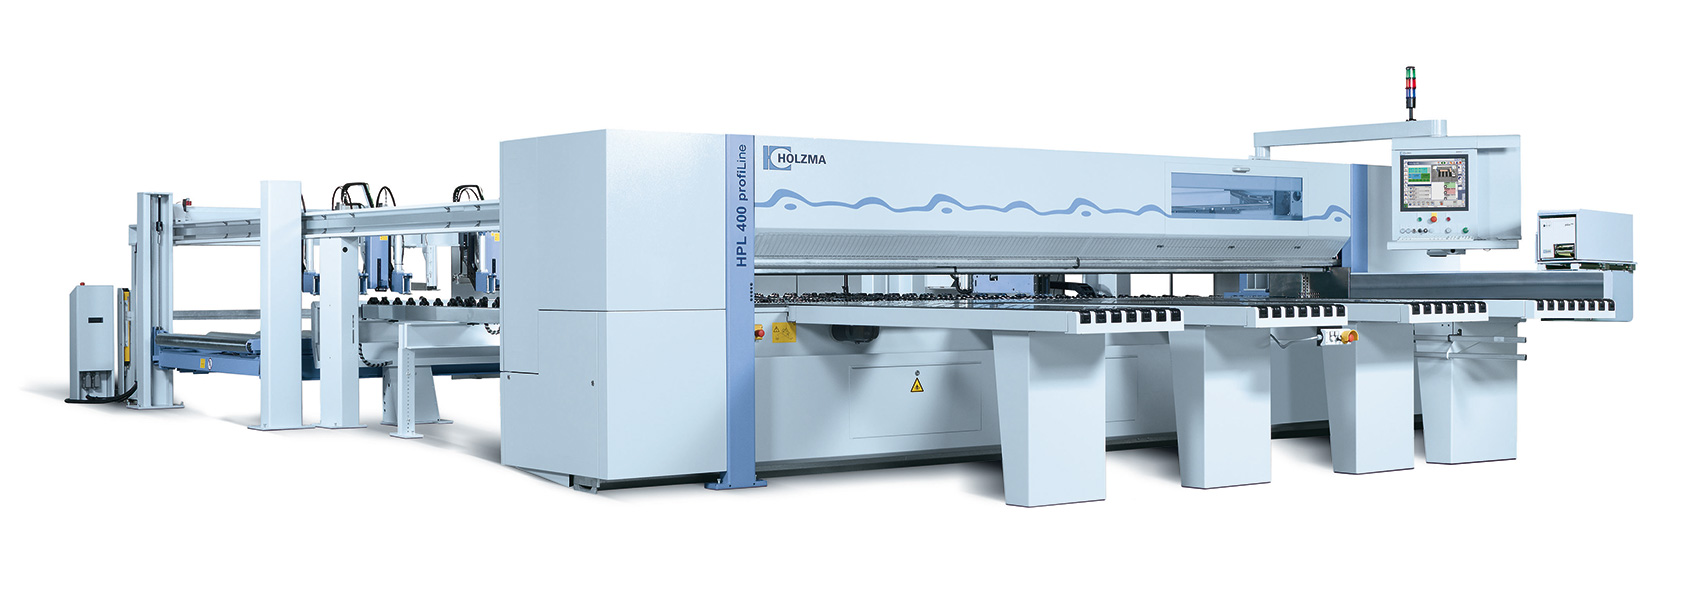 2013 BR4 HPL400 profiLine frontal weiss lr industrie panneaux